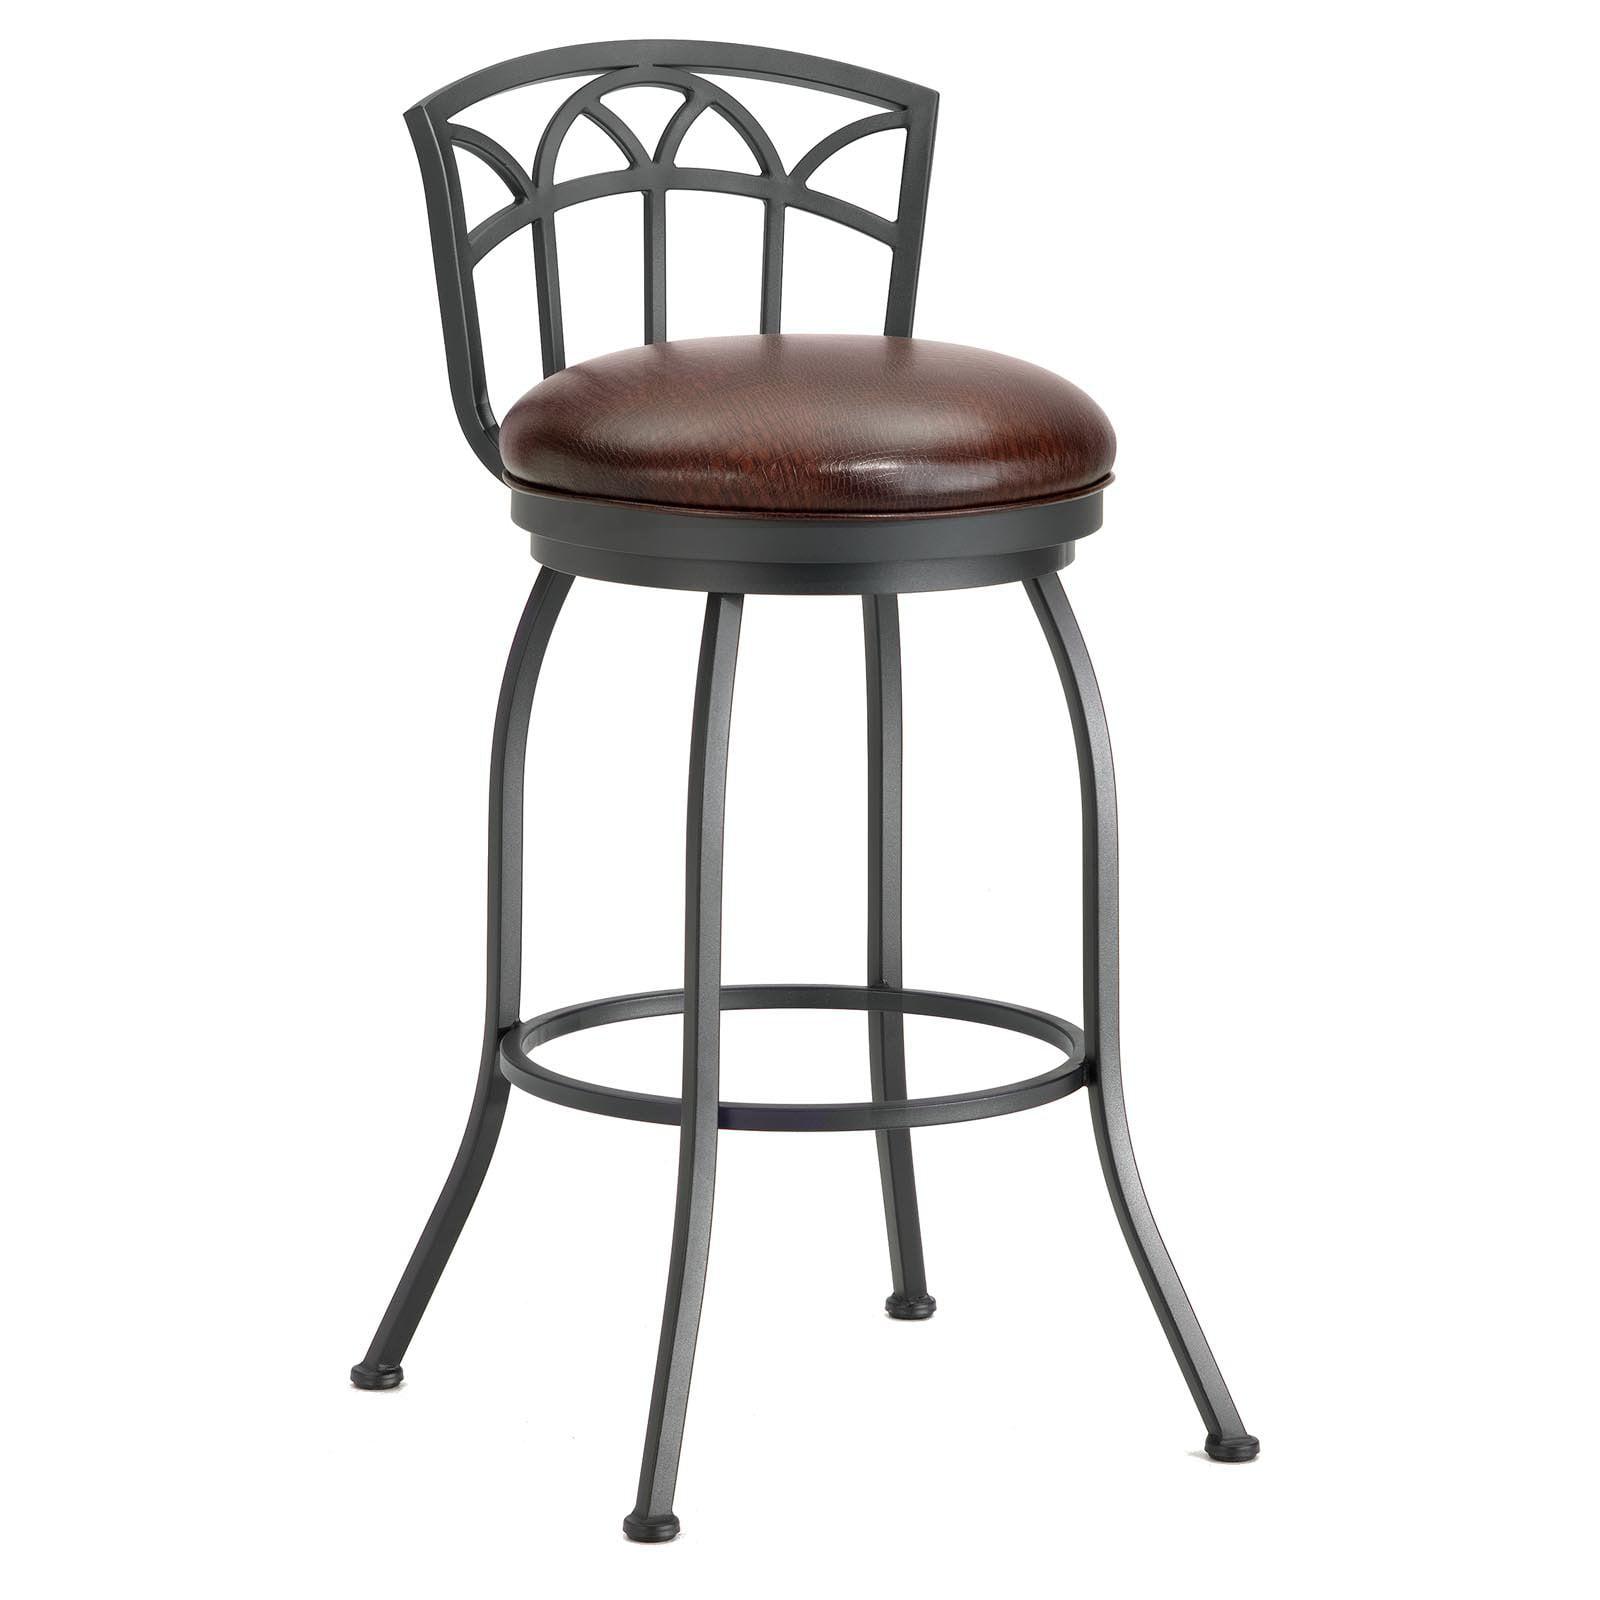 Barrington home fiesole low back bar stool walmart com